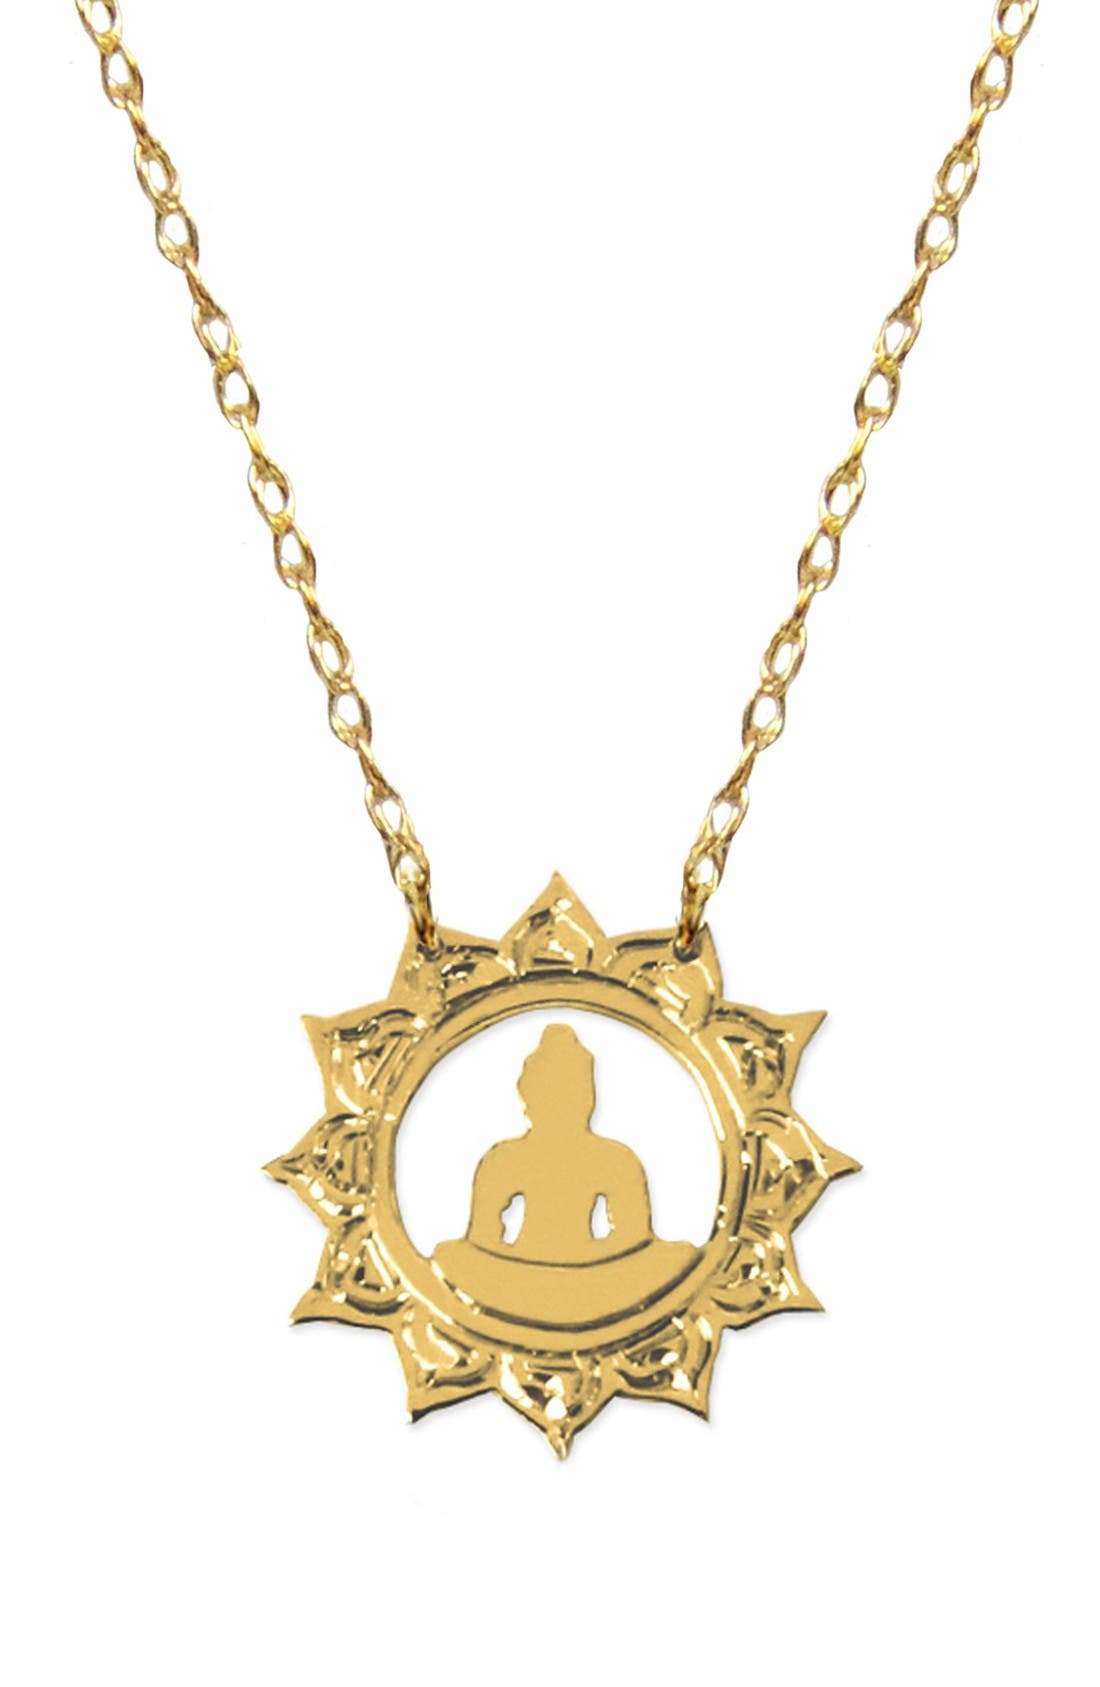 JANE BASCH DESIGNS Buddha Emoji Pendant Necklace